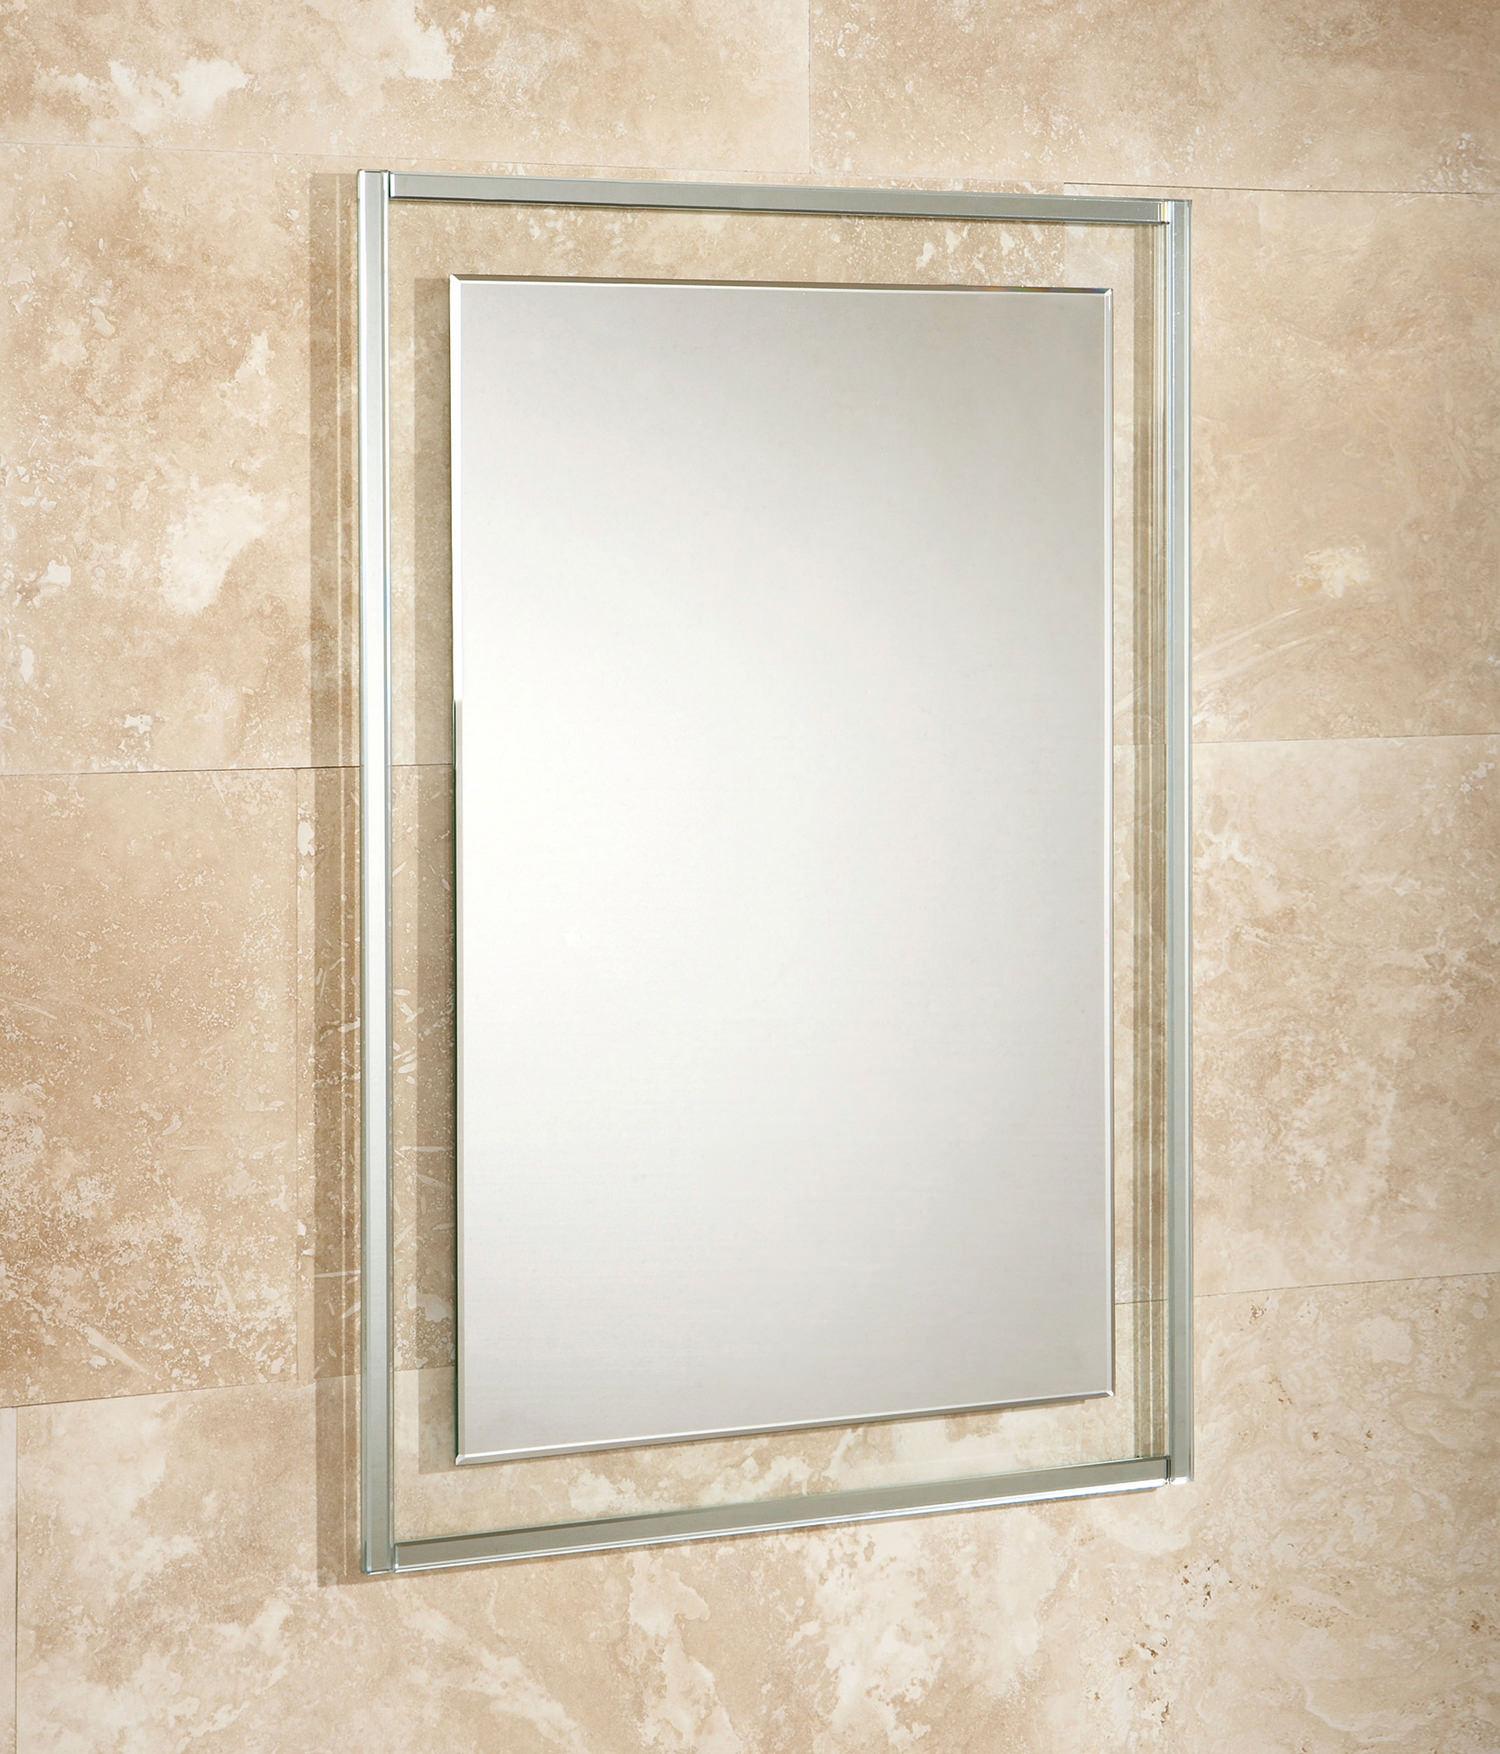 Hib georgia bevelled edge mirror on clear glass frame 500 x 700mm 76060500 for Bevelled edge bathroom mirror